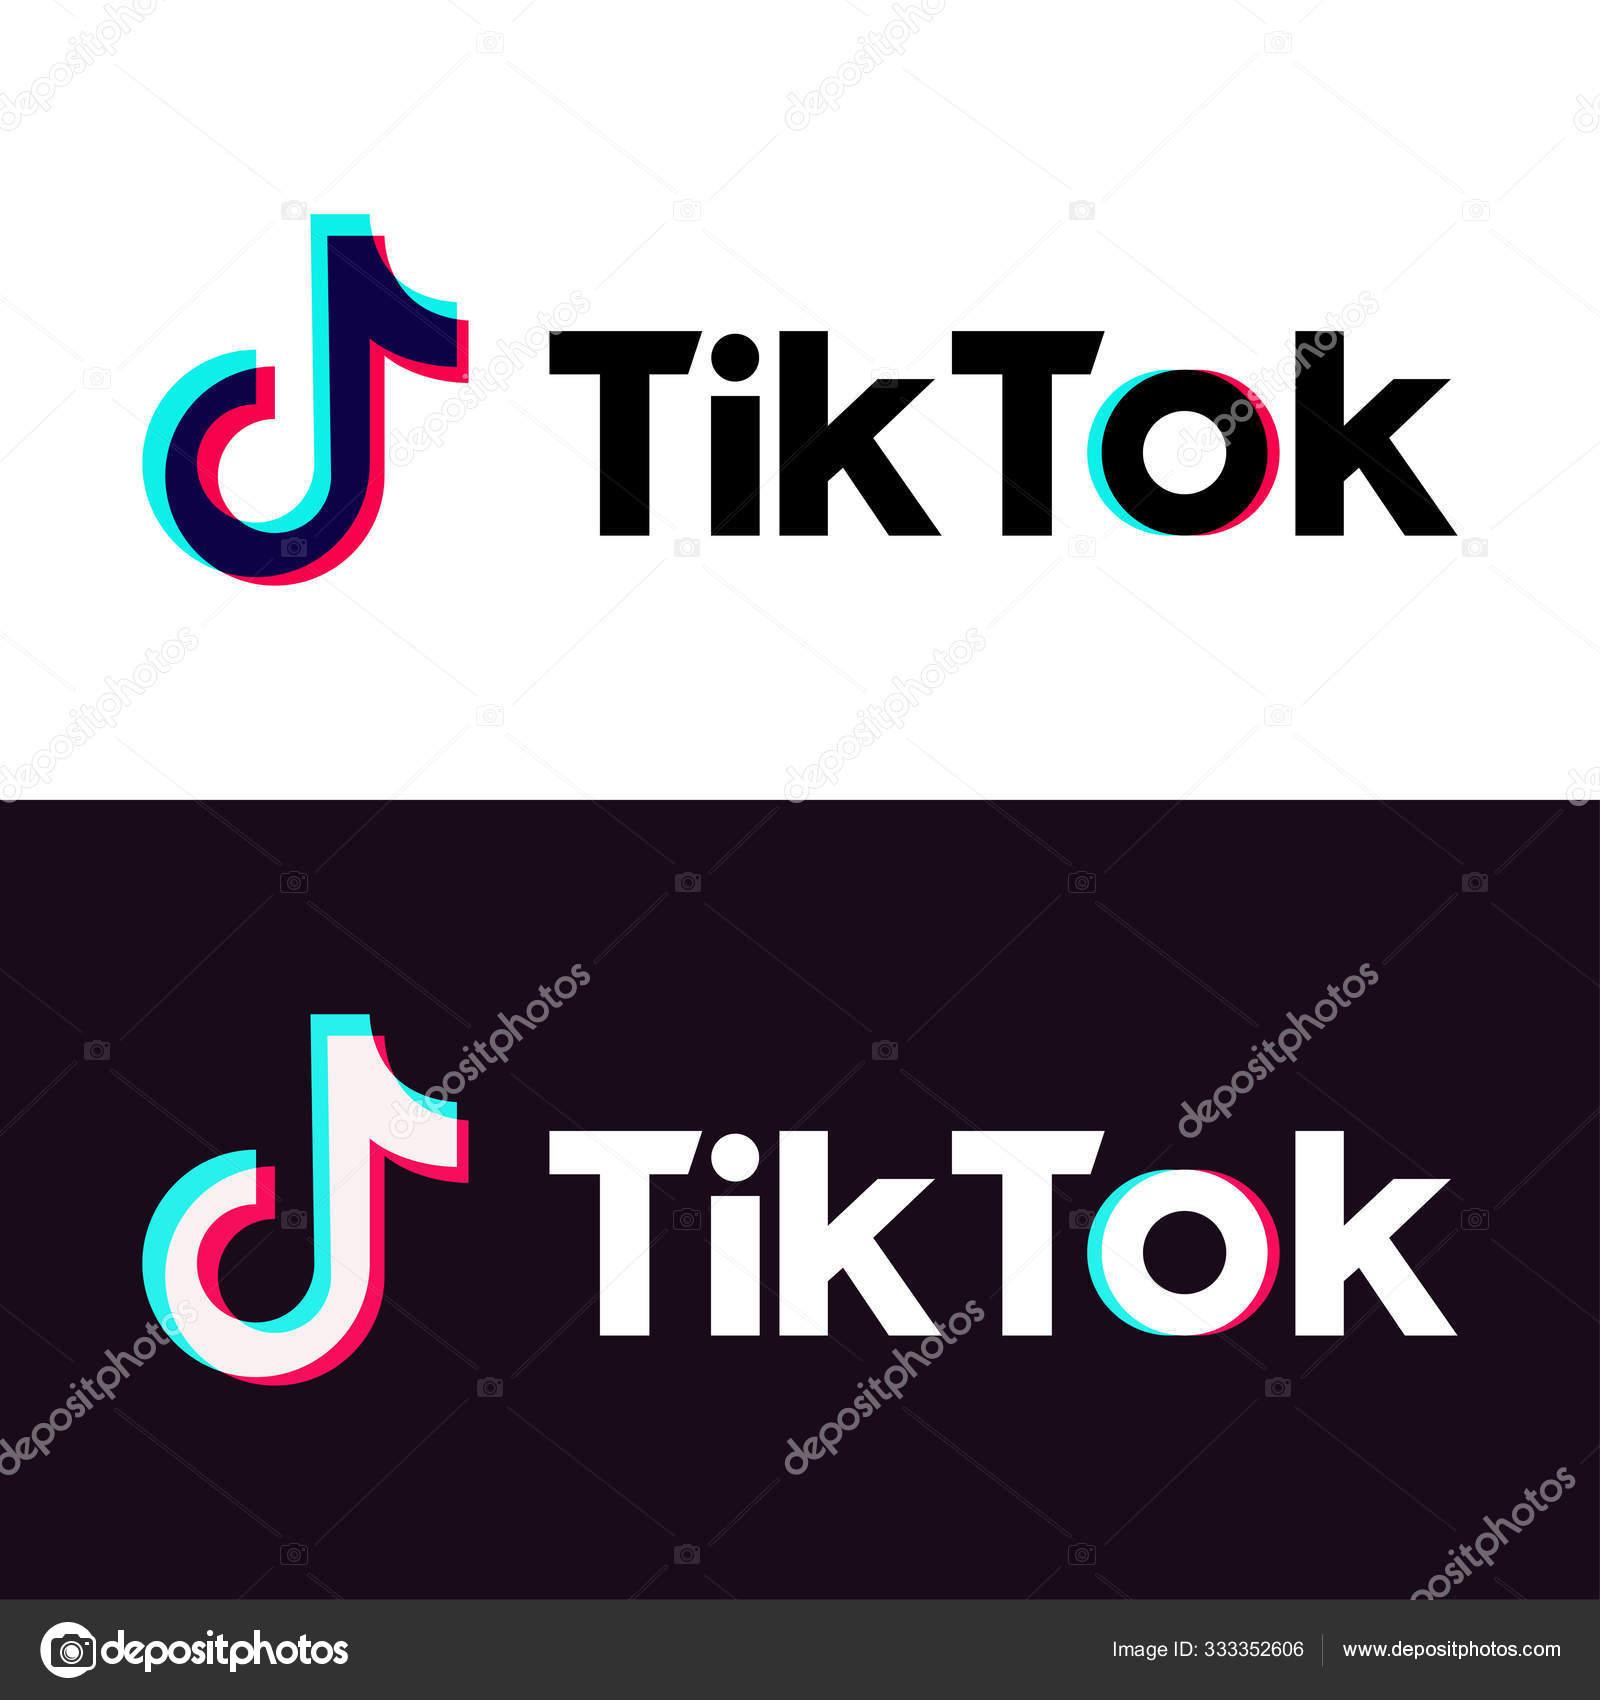 Tiktok Stock Vectors Royalty Free Tiktok Illustrations Depositphotos